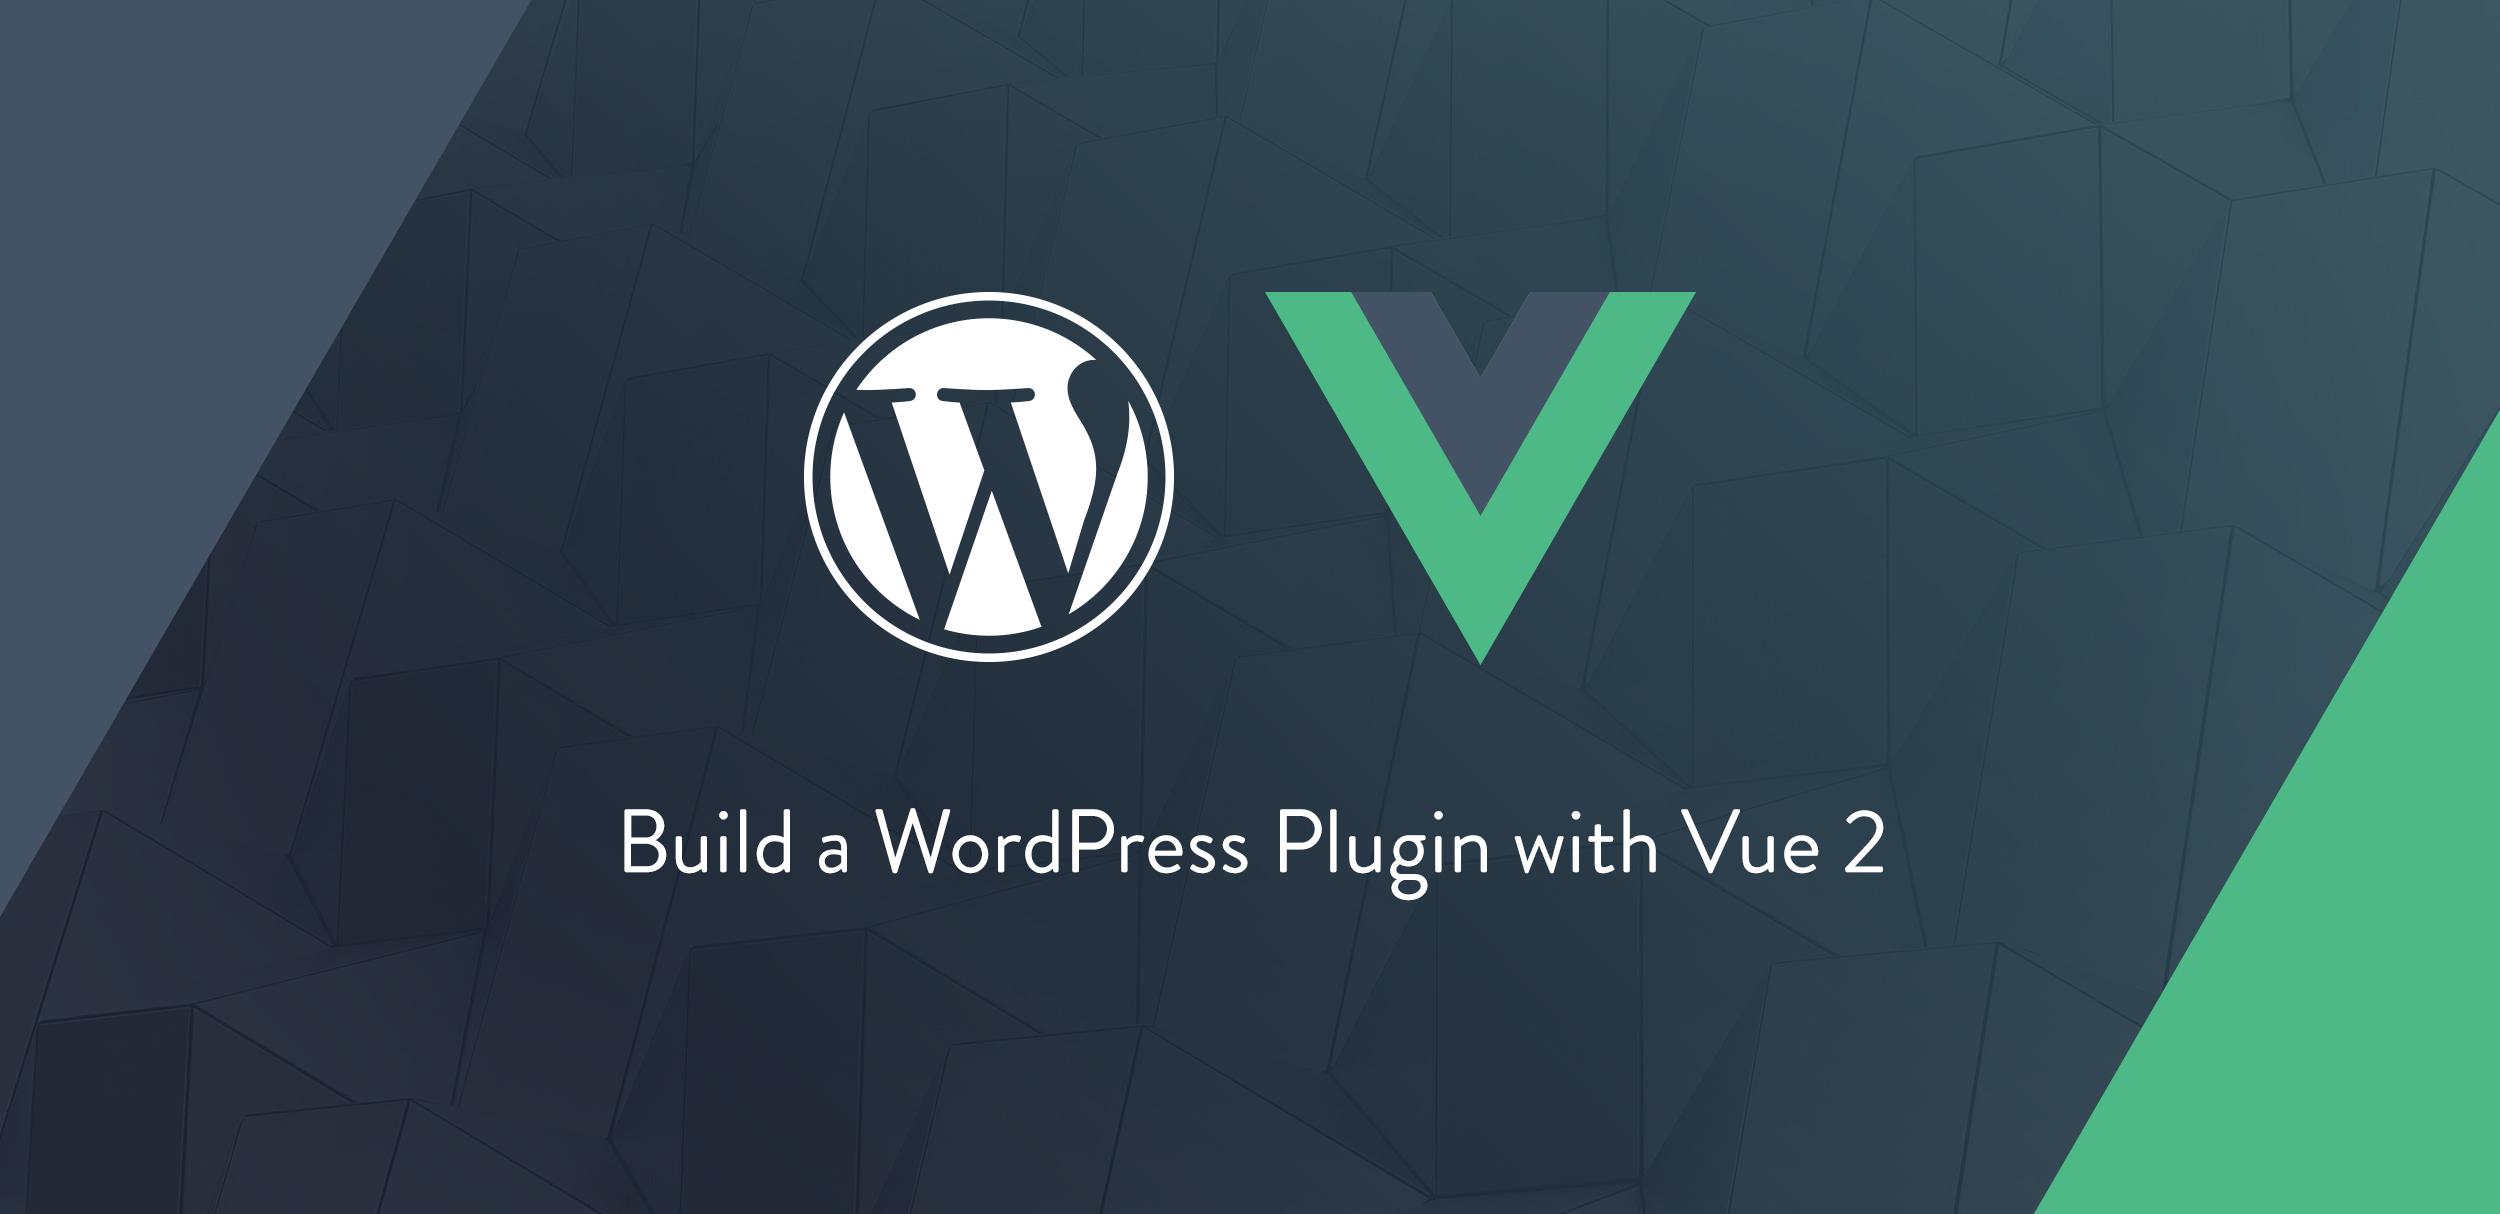 Build a WordPress Plugin with Vue 2